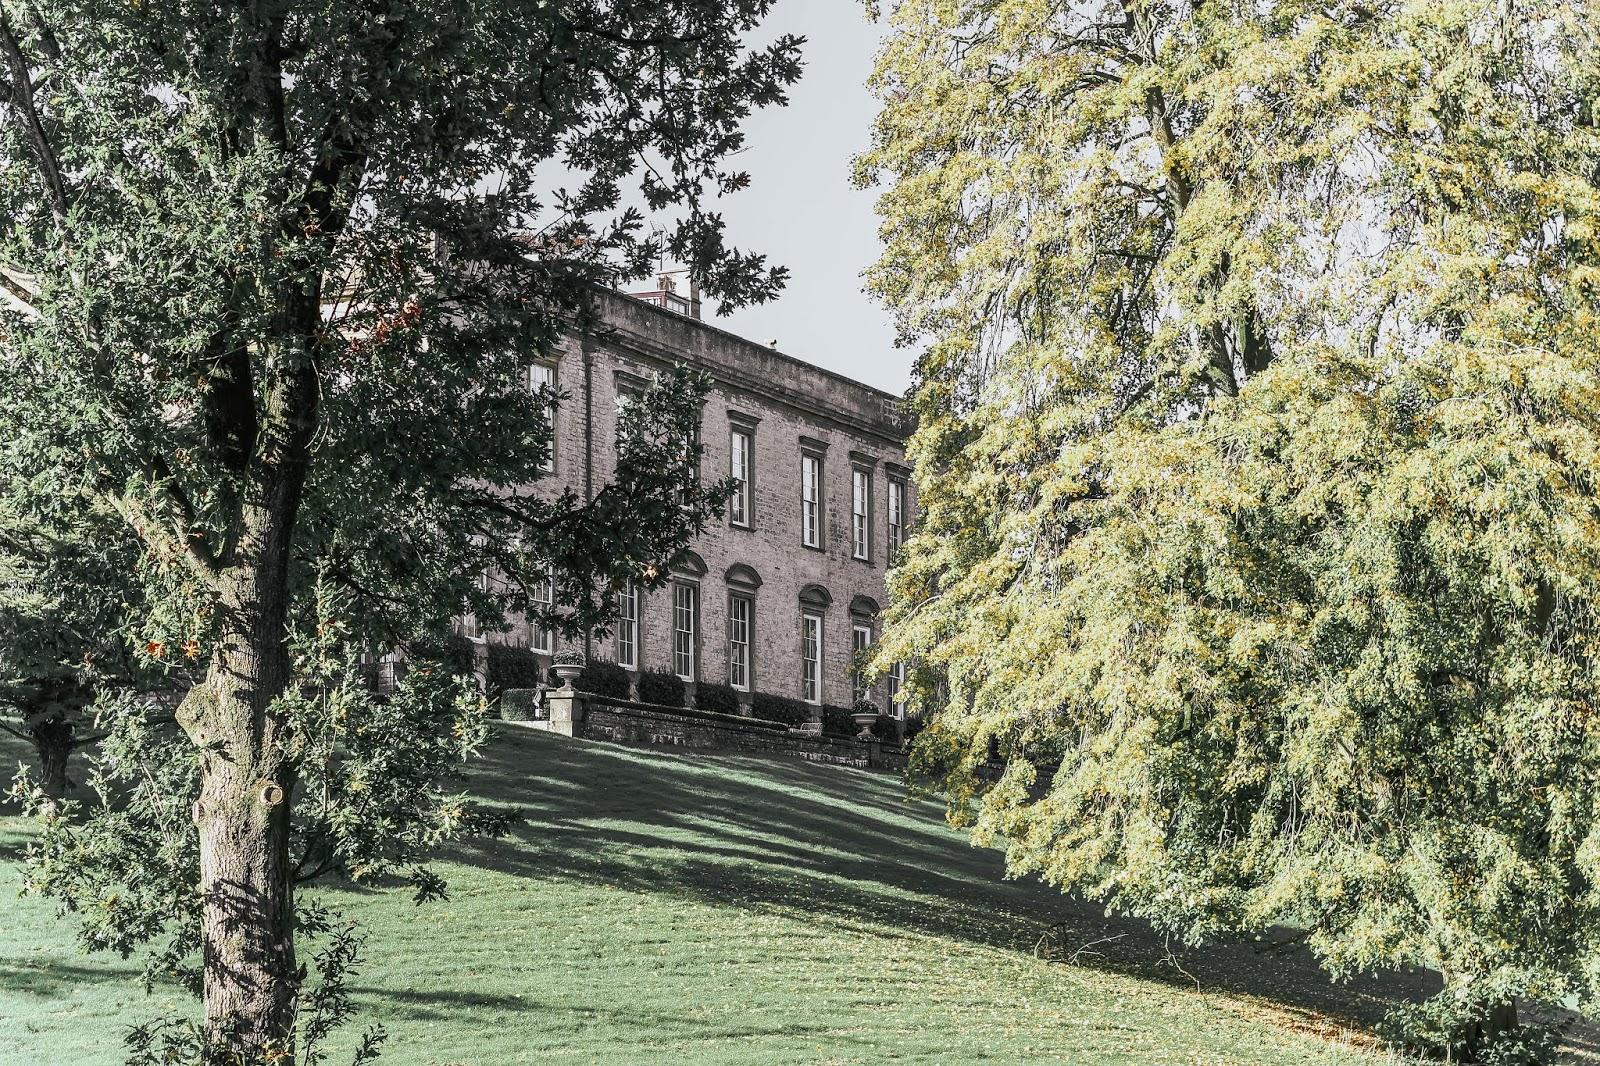 Ston Easton Park Hotel Garden Travel Blog Review